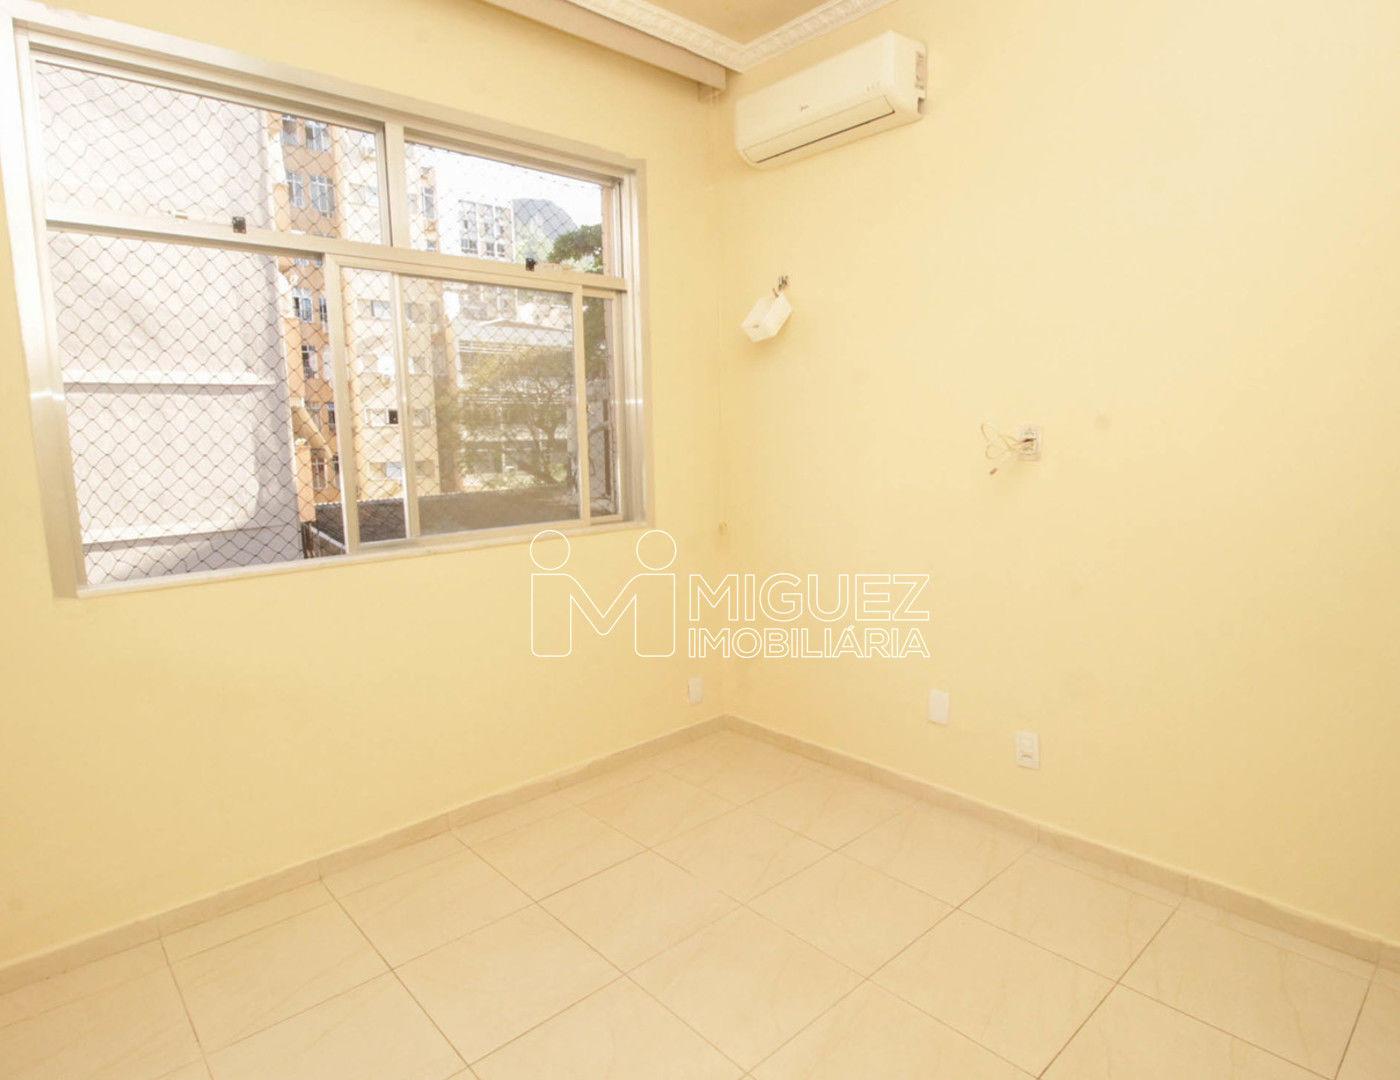 Apartamento, aluguel, Rua Professor Gabiso - Tijuca , Rio de janeiro